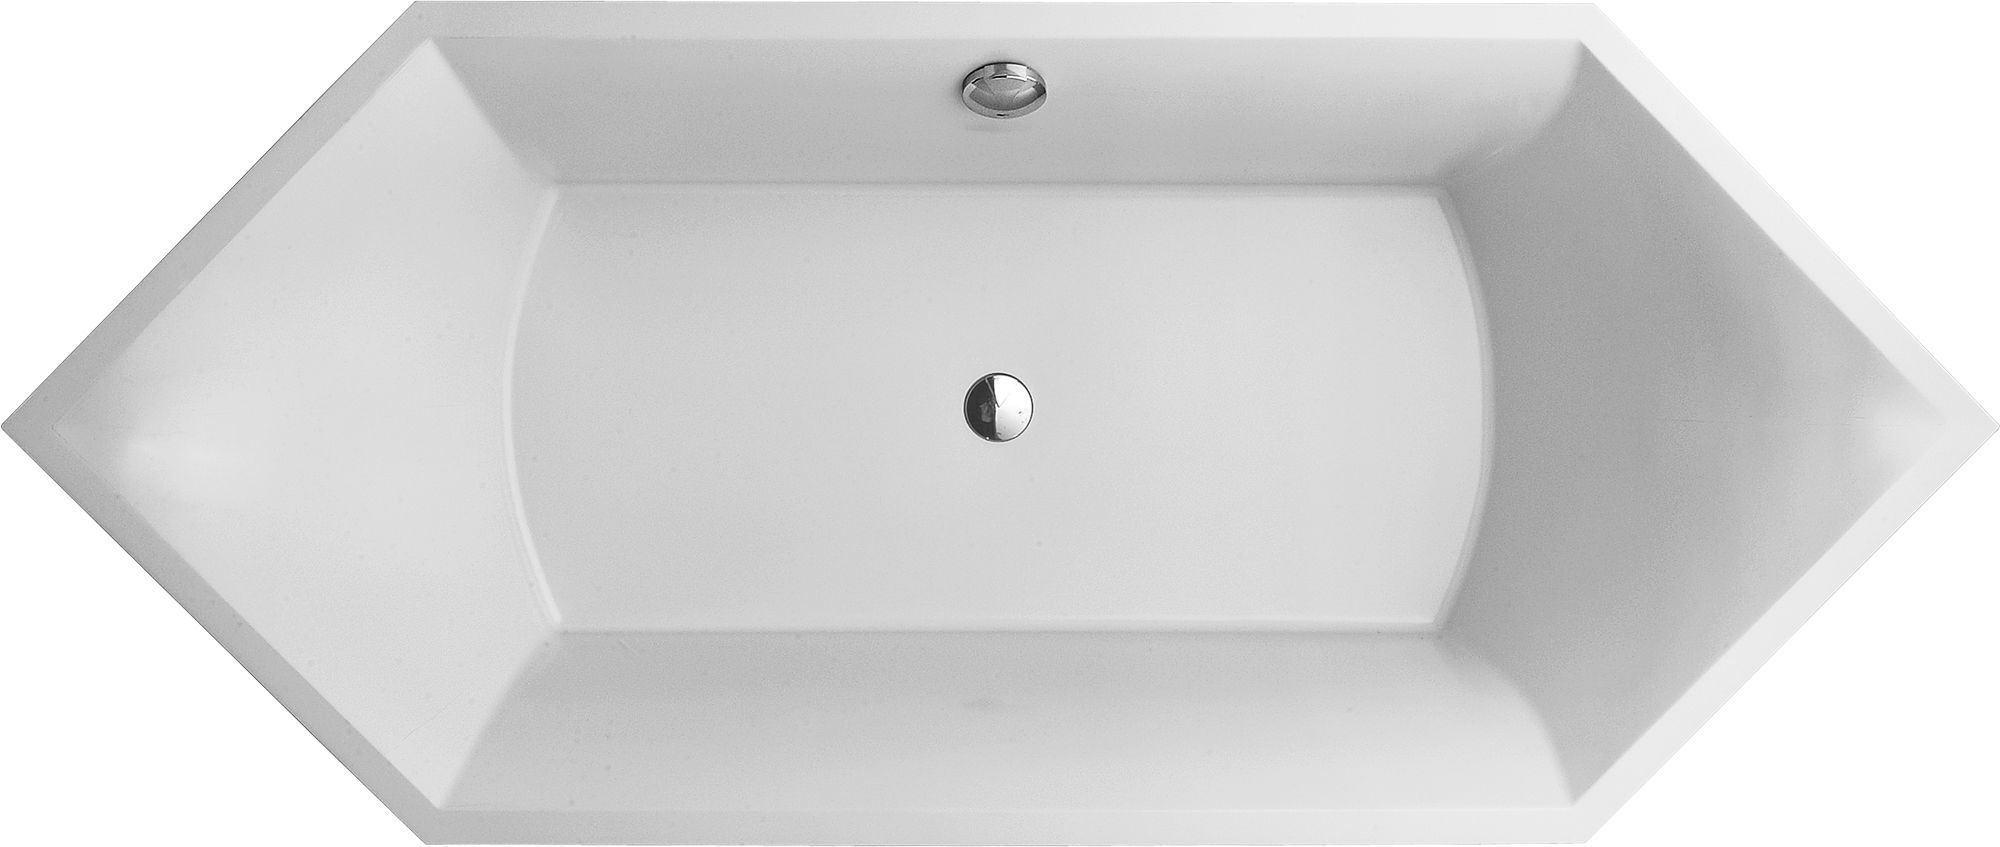 Villeroy & Boch Squaro Badewanne Rechteck UBQ190SQR6V-01 H: 500 B: 800 L: 1900 weiß